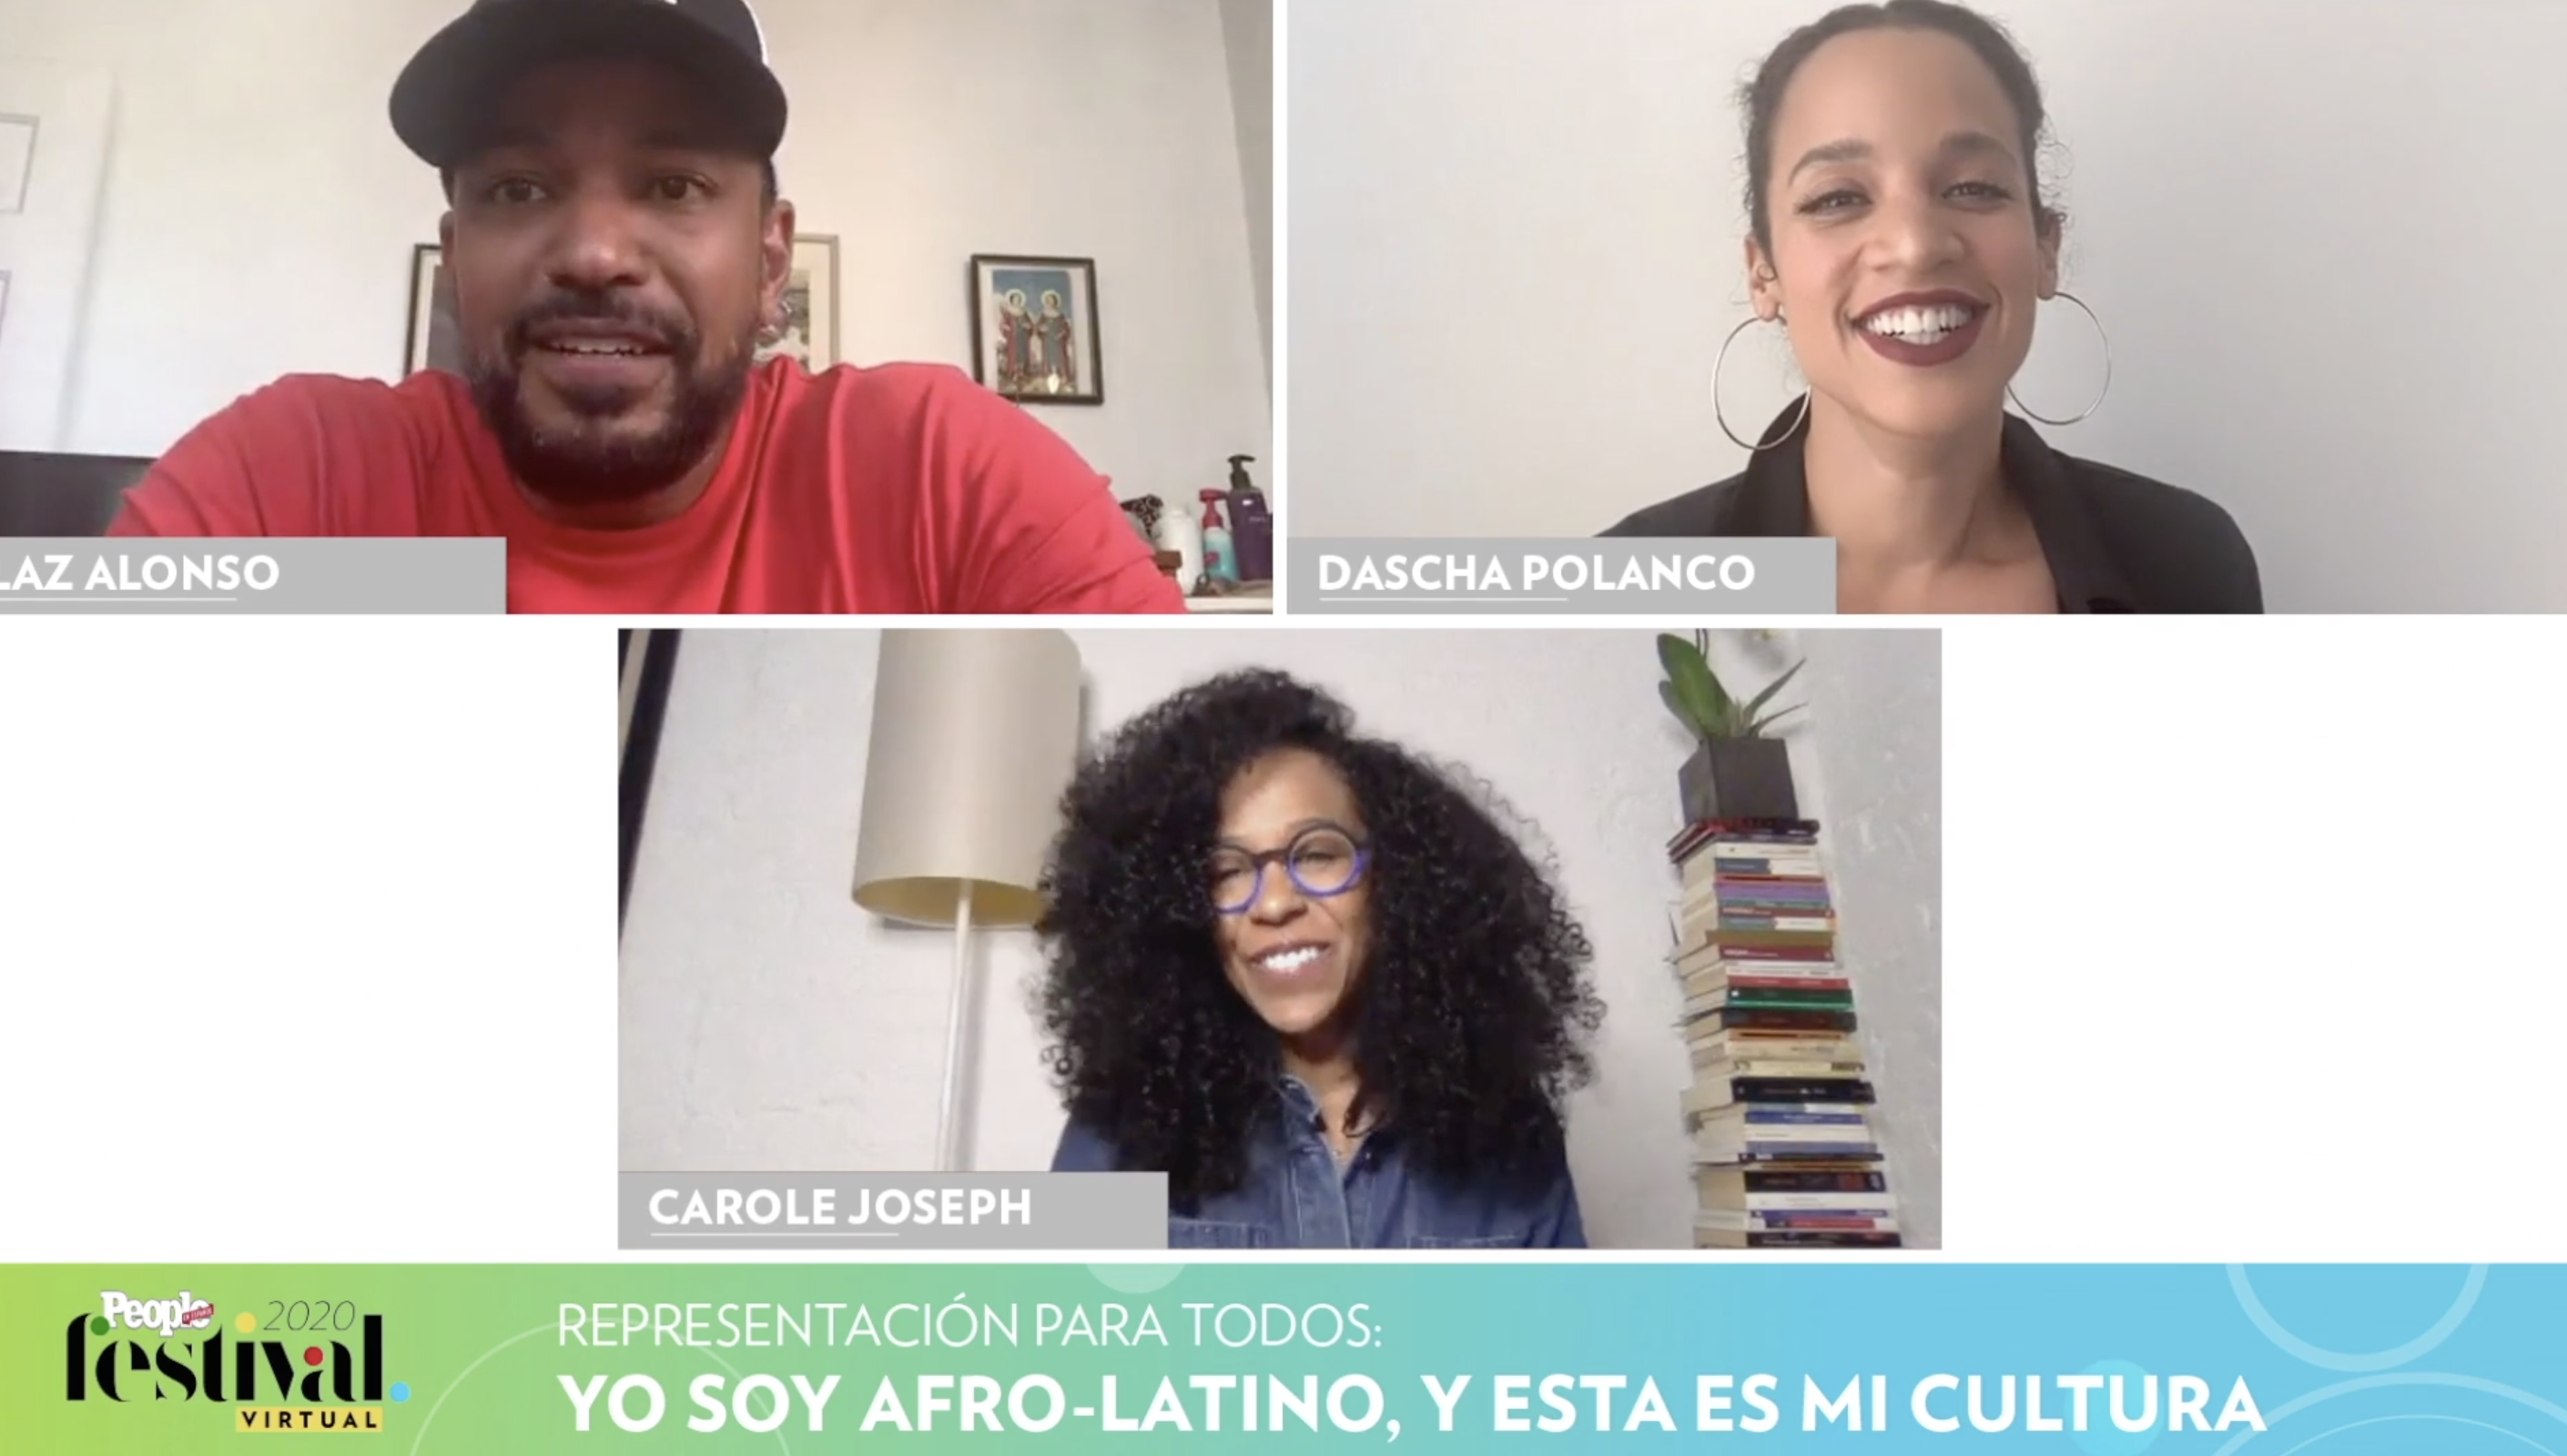 Laz Alonso, Dascha Polanco y Carole Jospeh